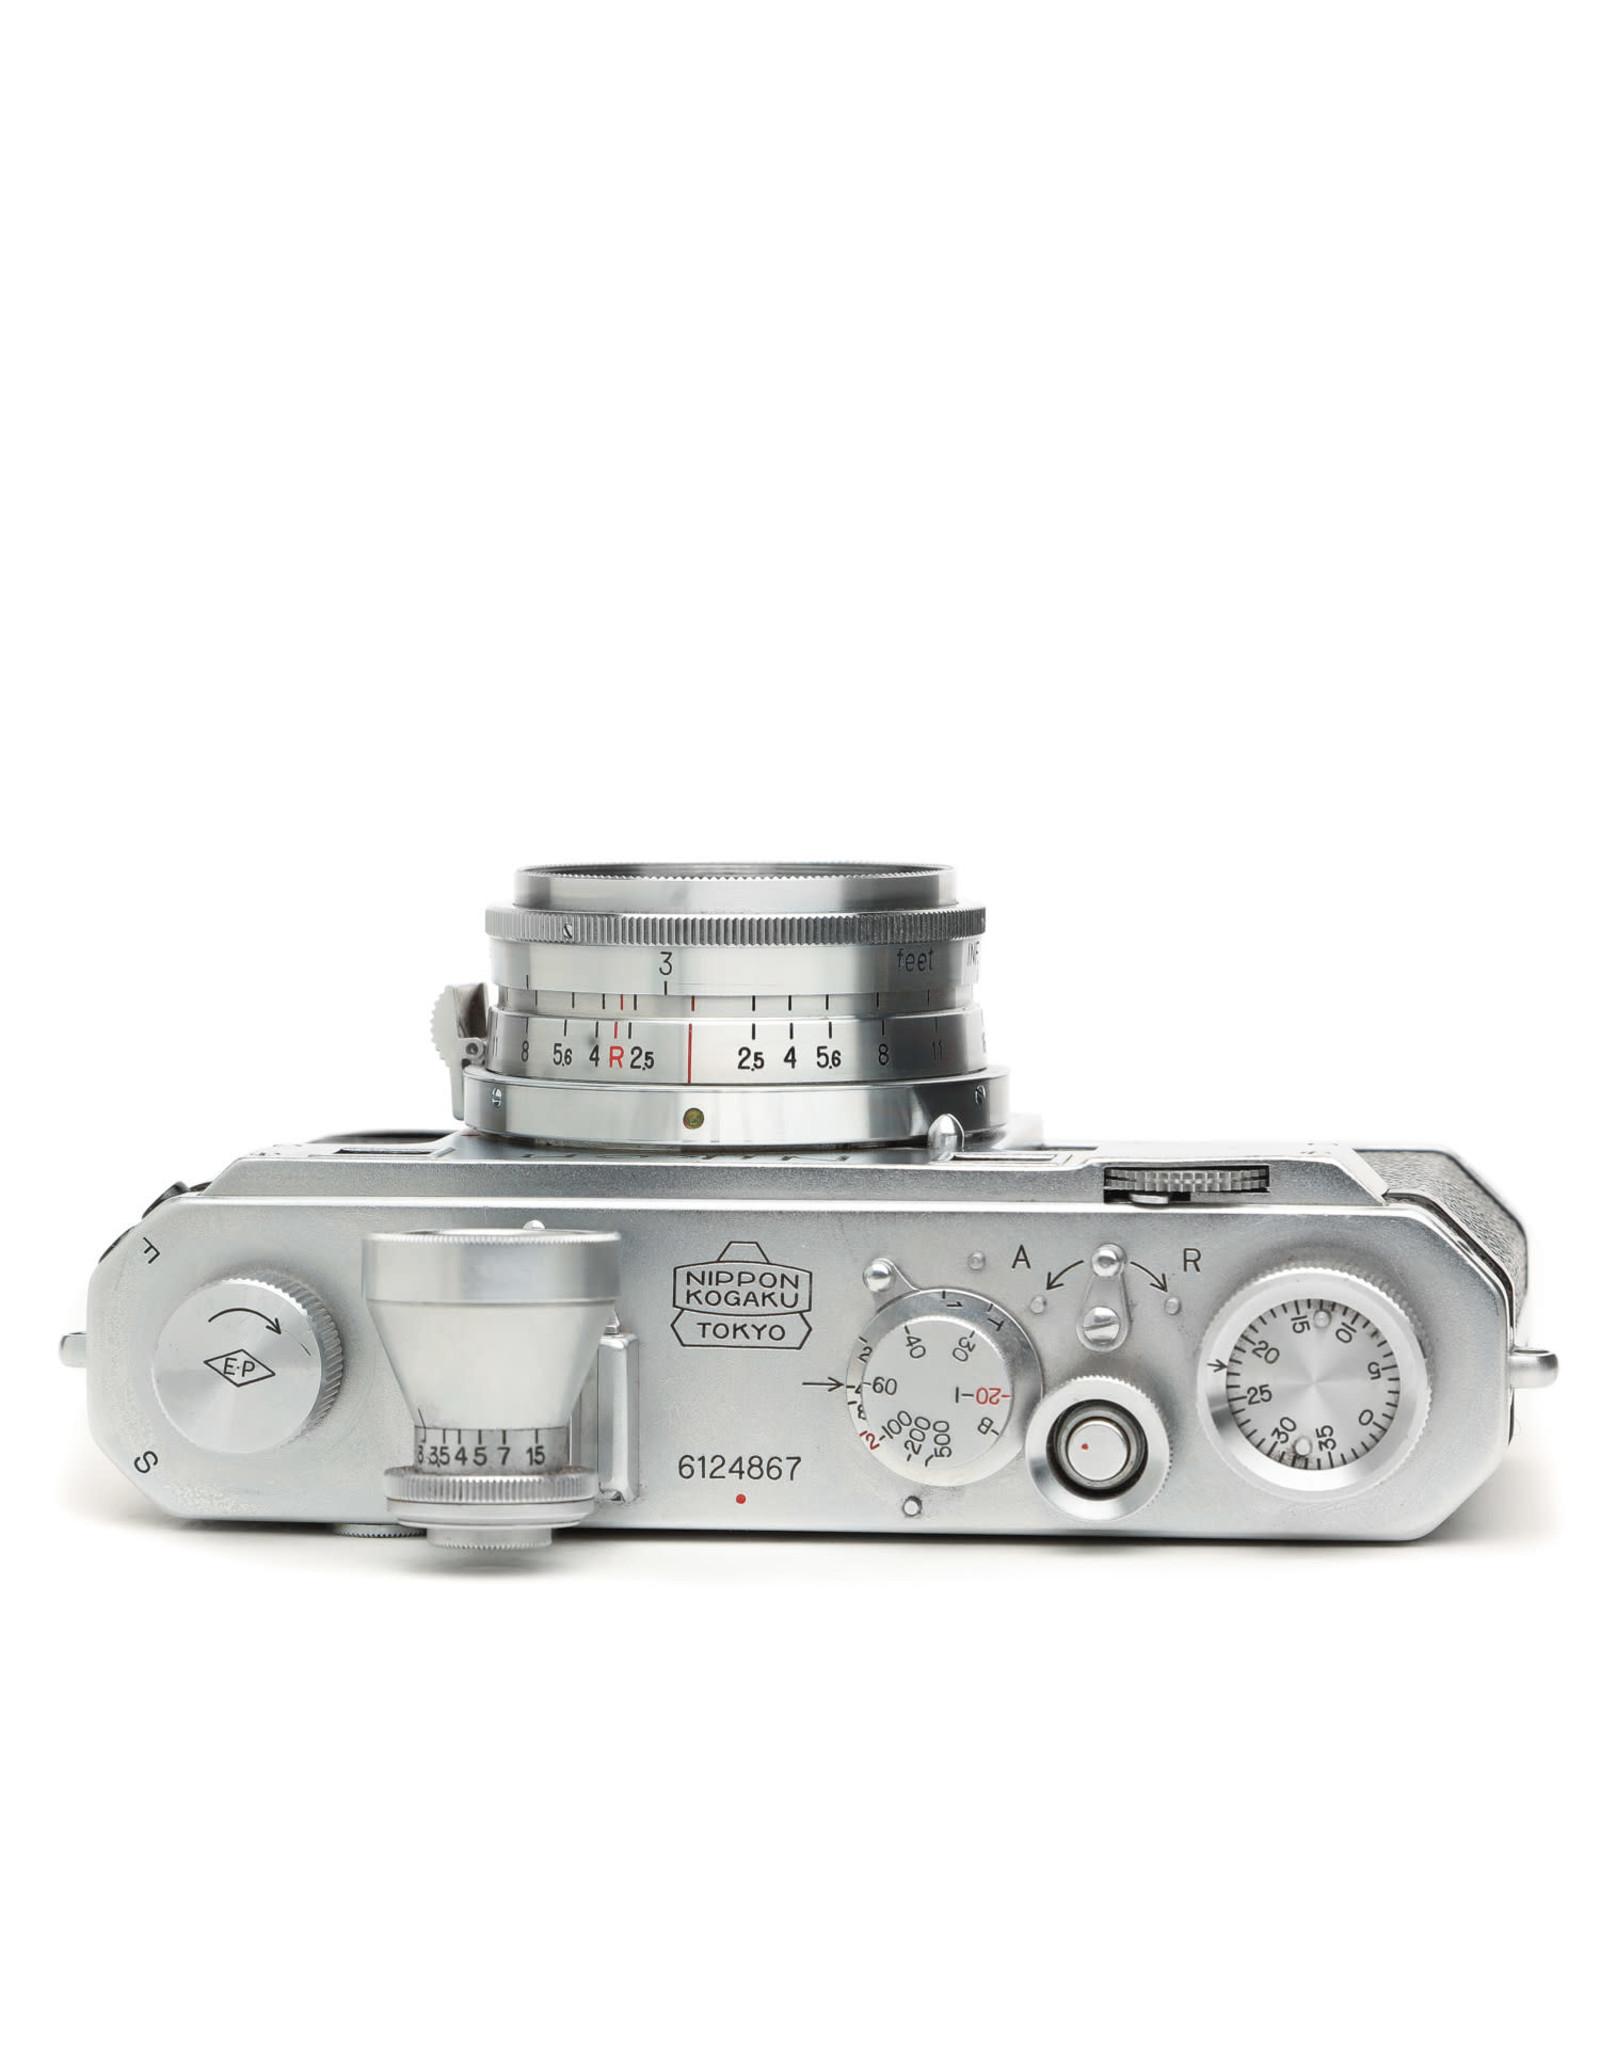 Nikon Nikon S Rangefinder Camera w/ Jupiter 8 lens